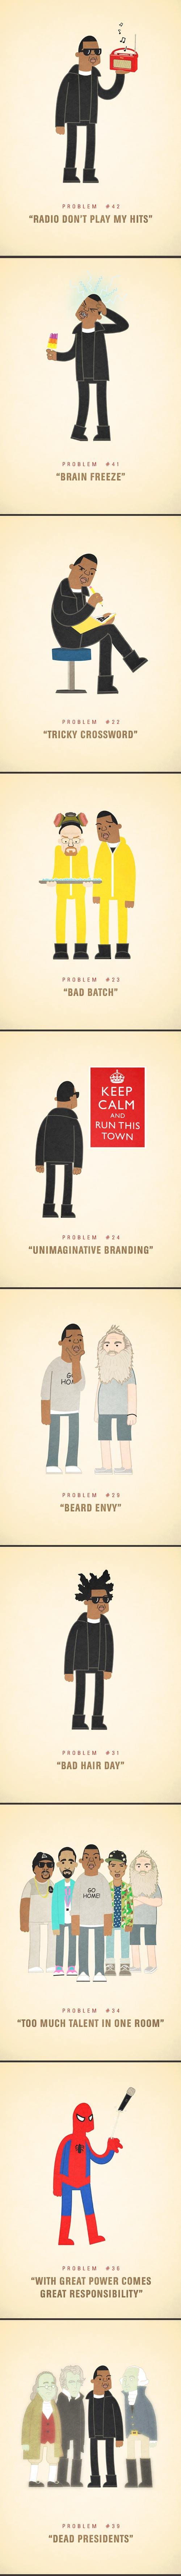 Few problems...